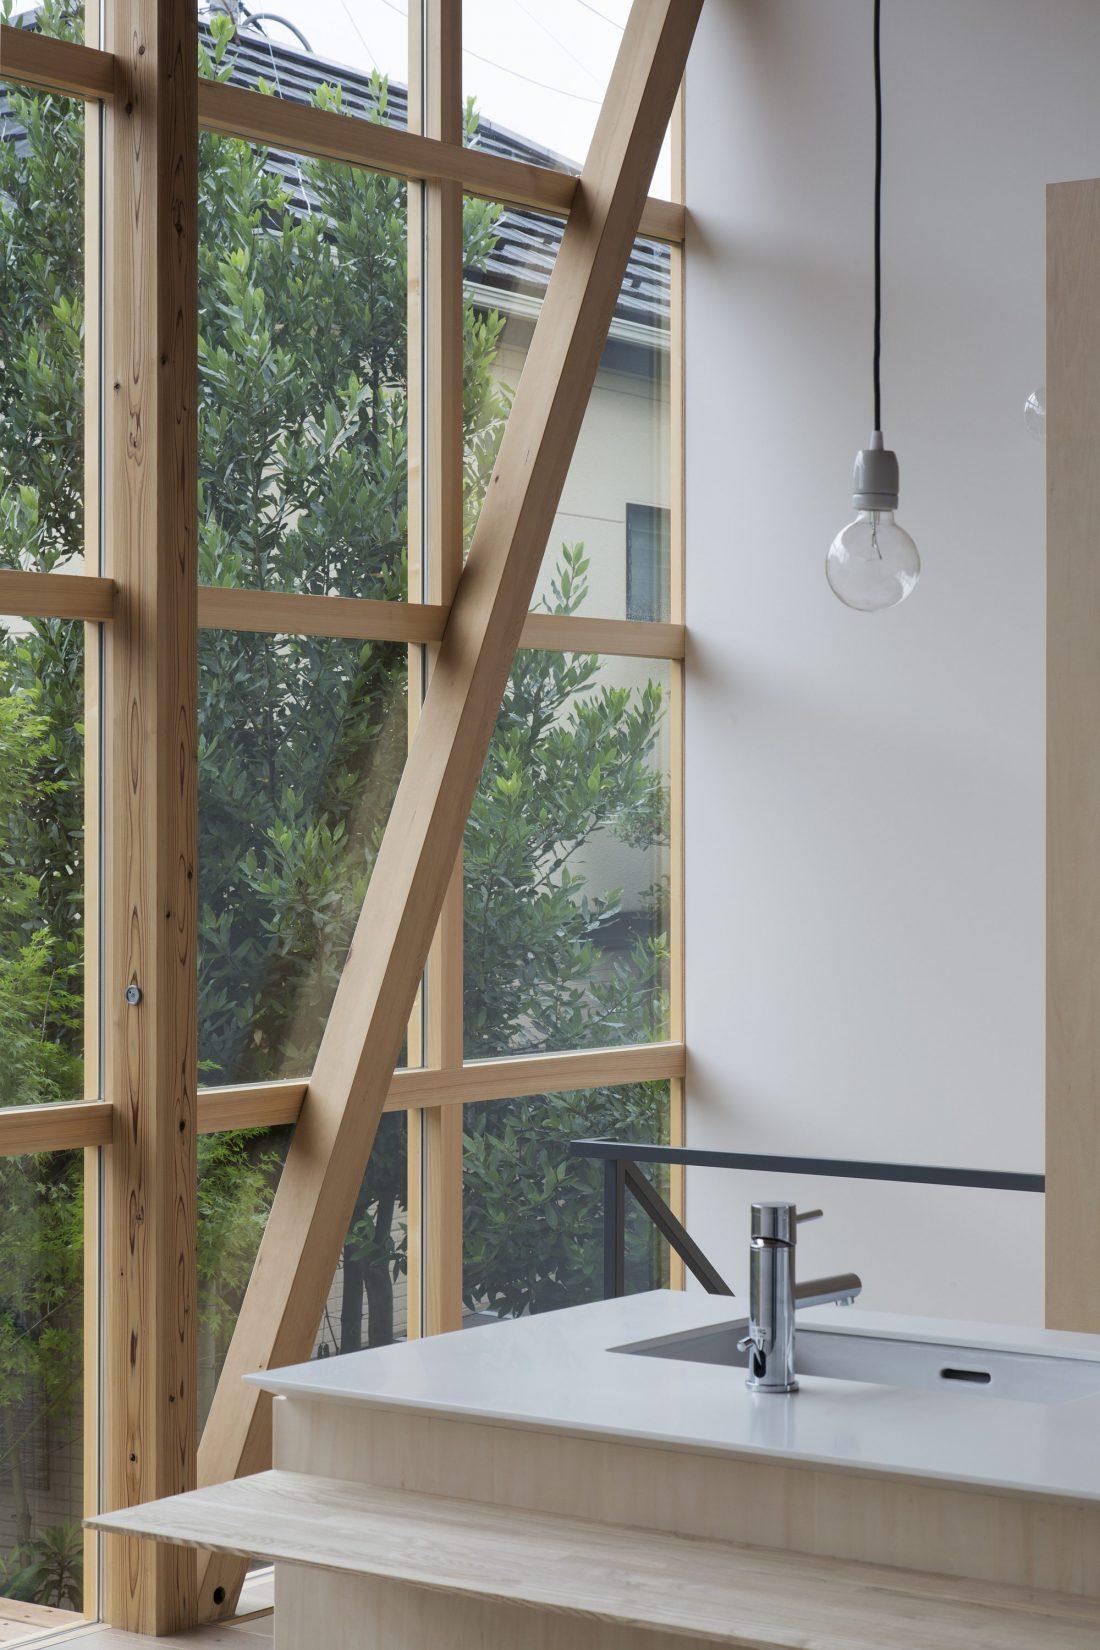 Дом в Токио по системе Shakkanho по проекту Tetsuo Yamaji 11